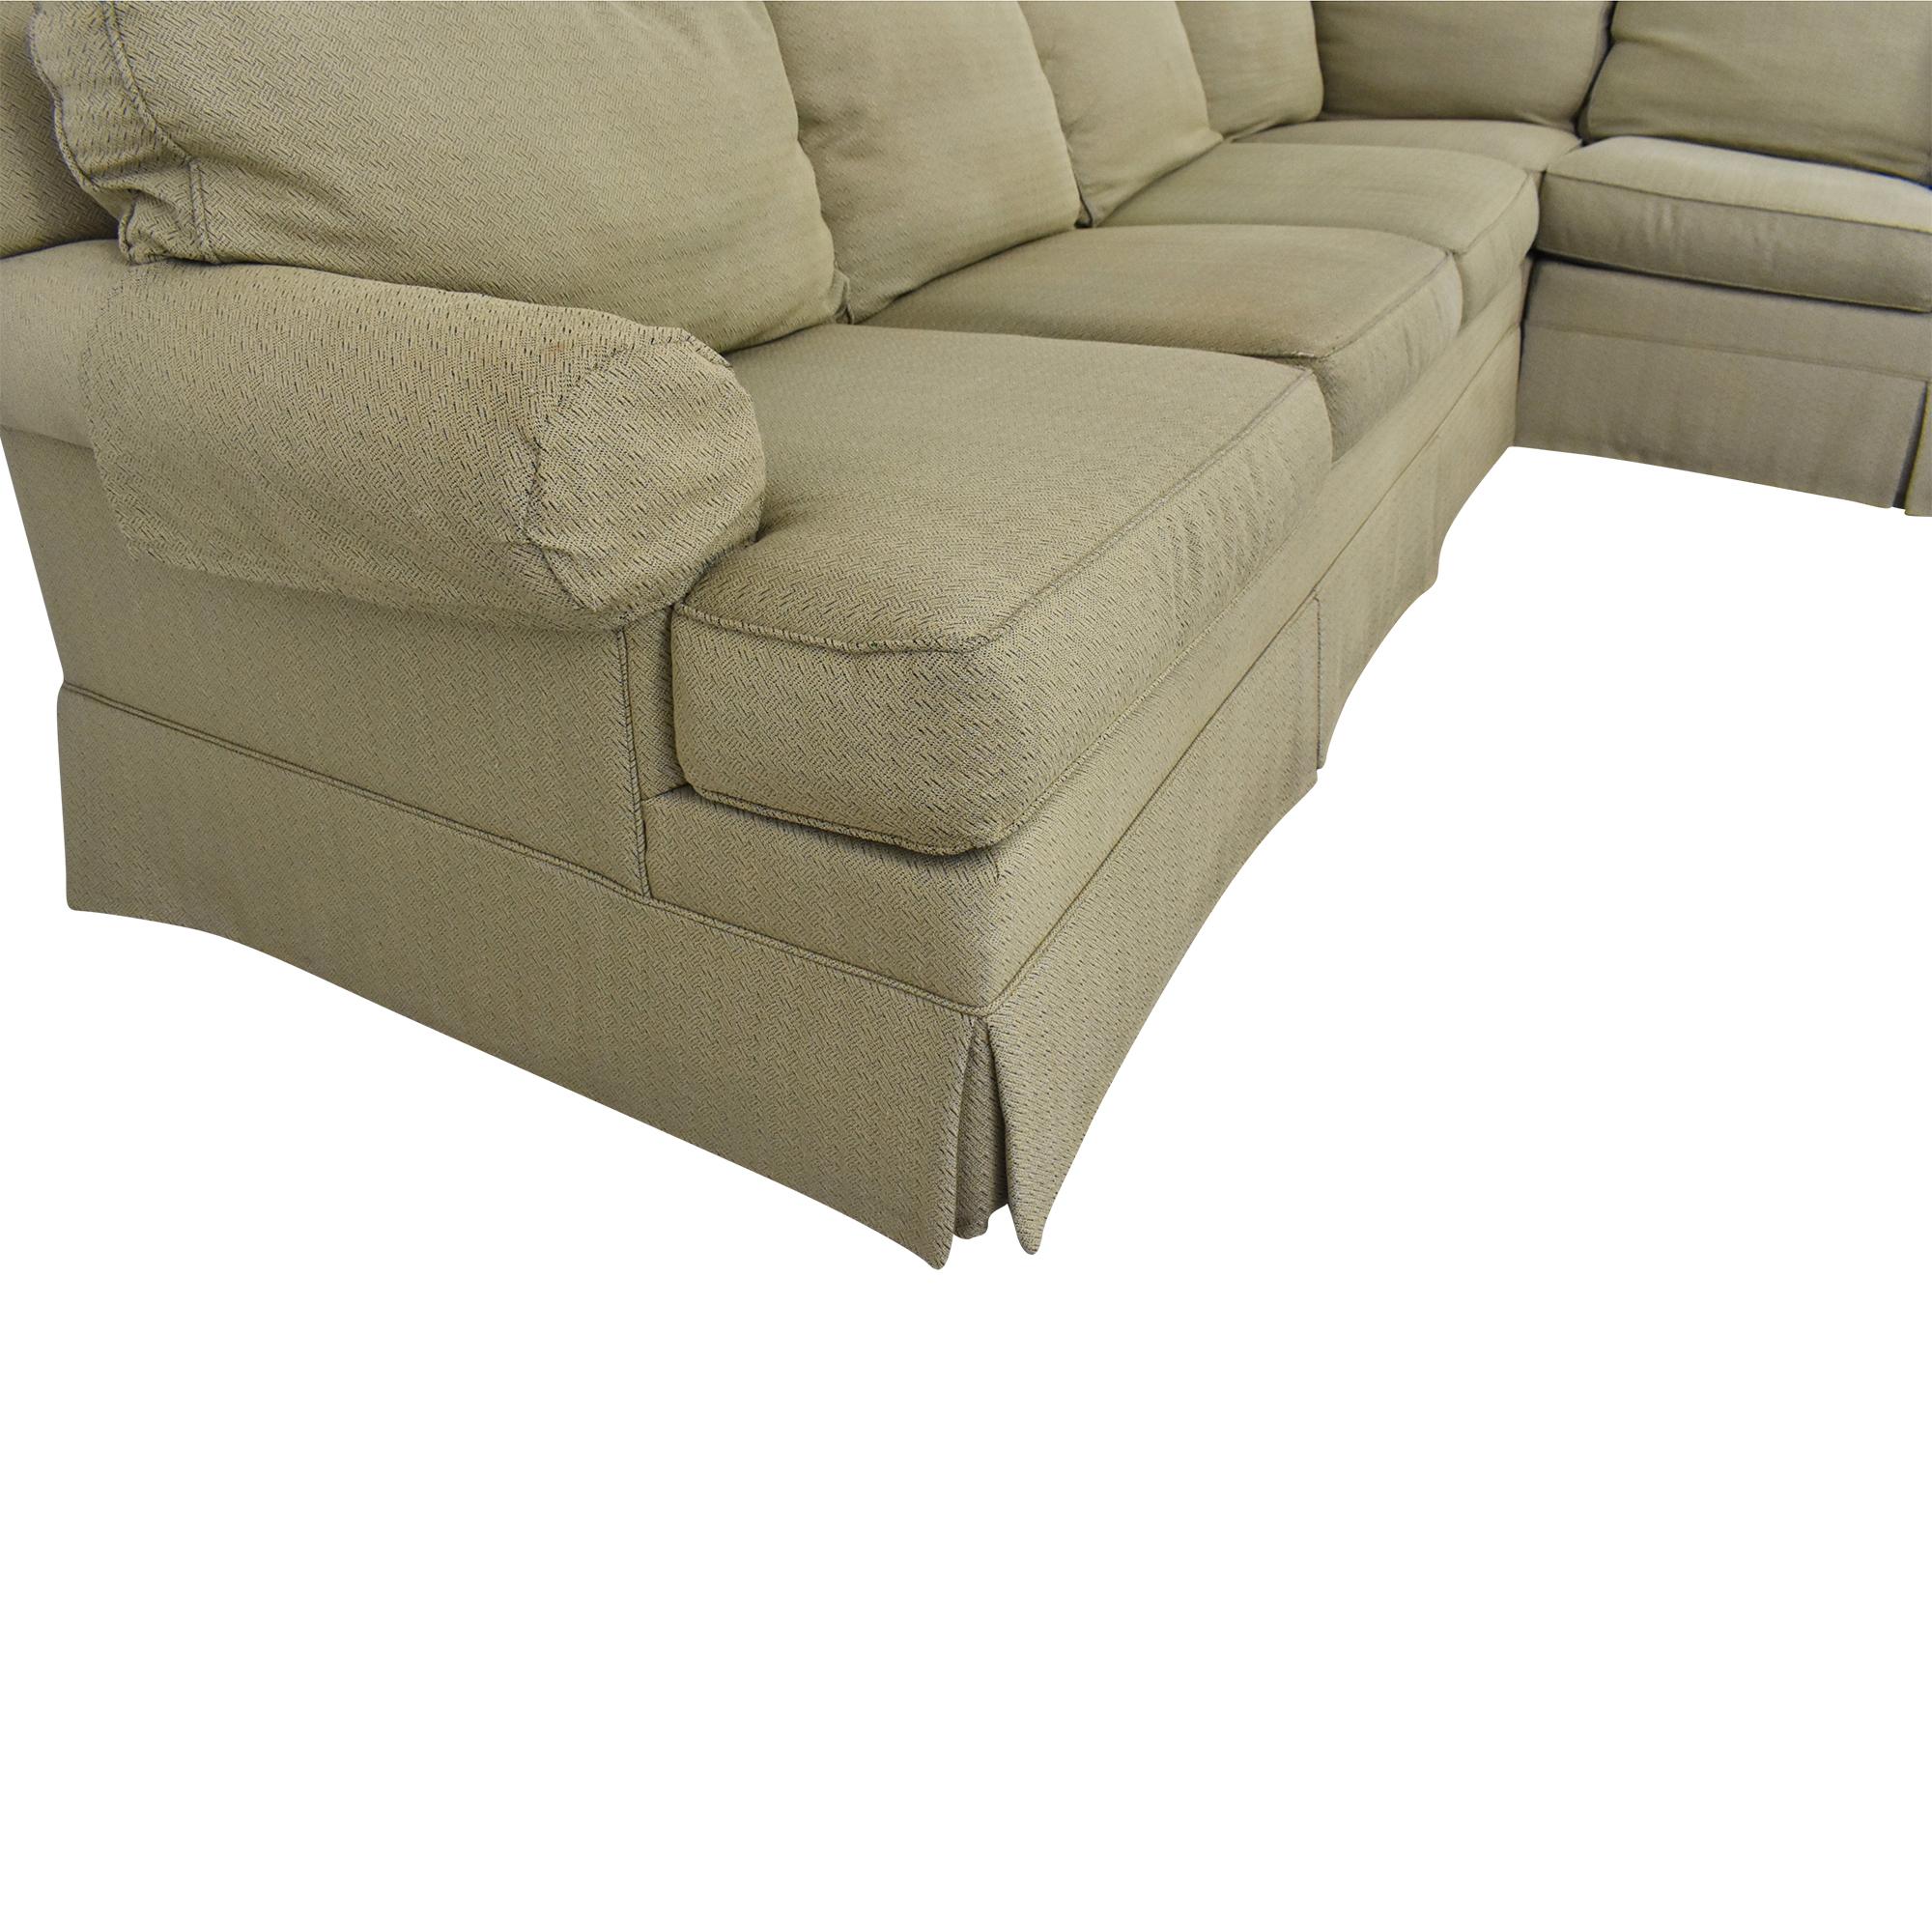 buy Ethan Allen Ethan Allan Skirted Sectional Sofa online